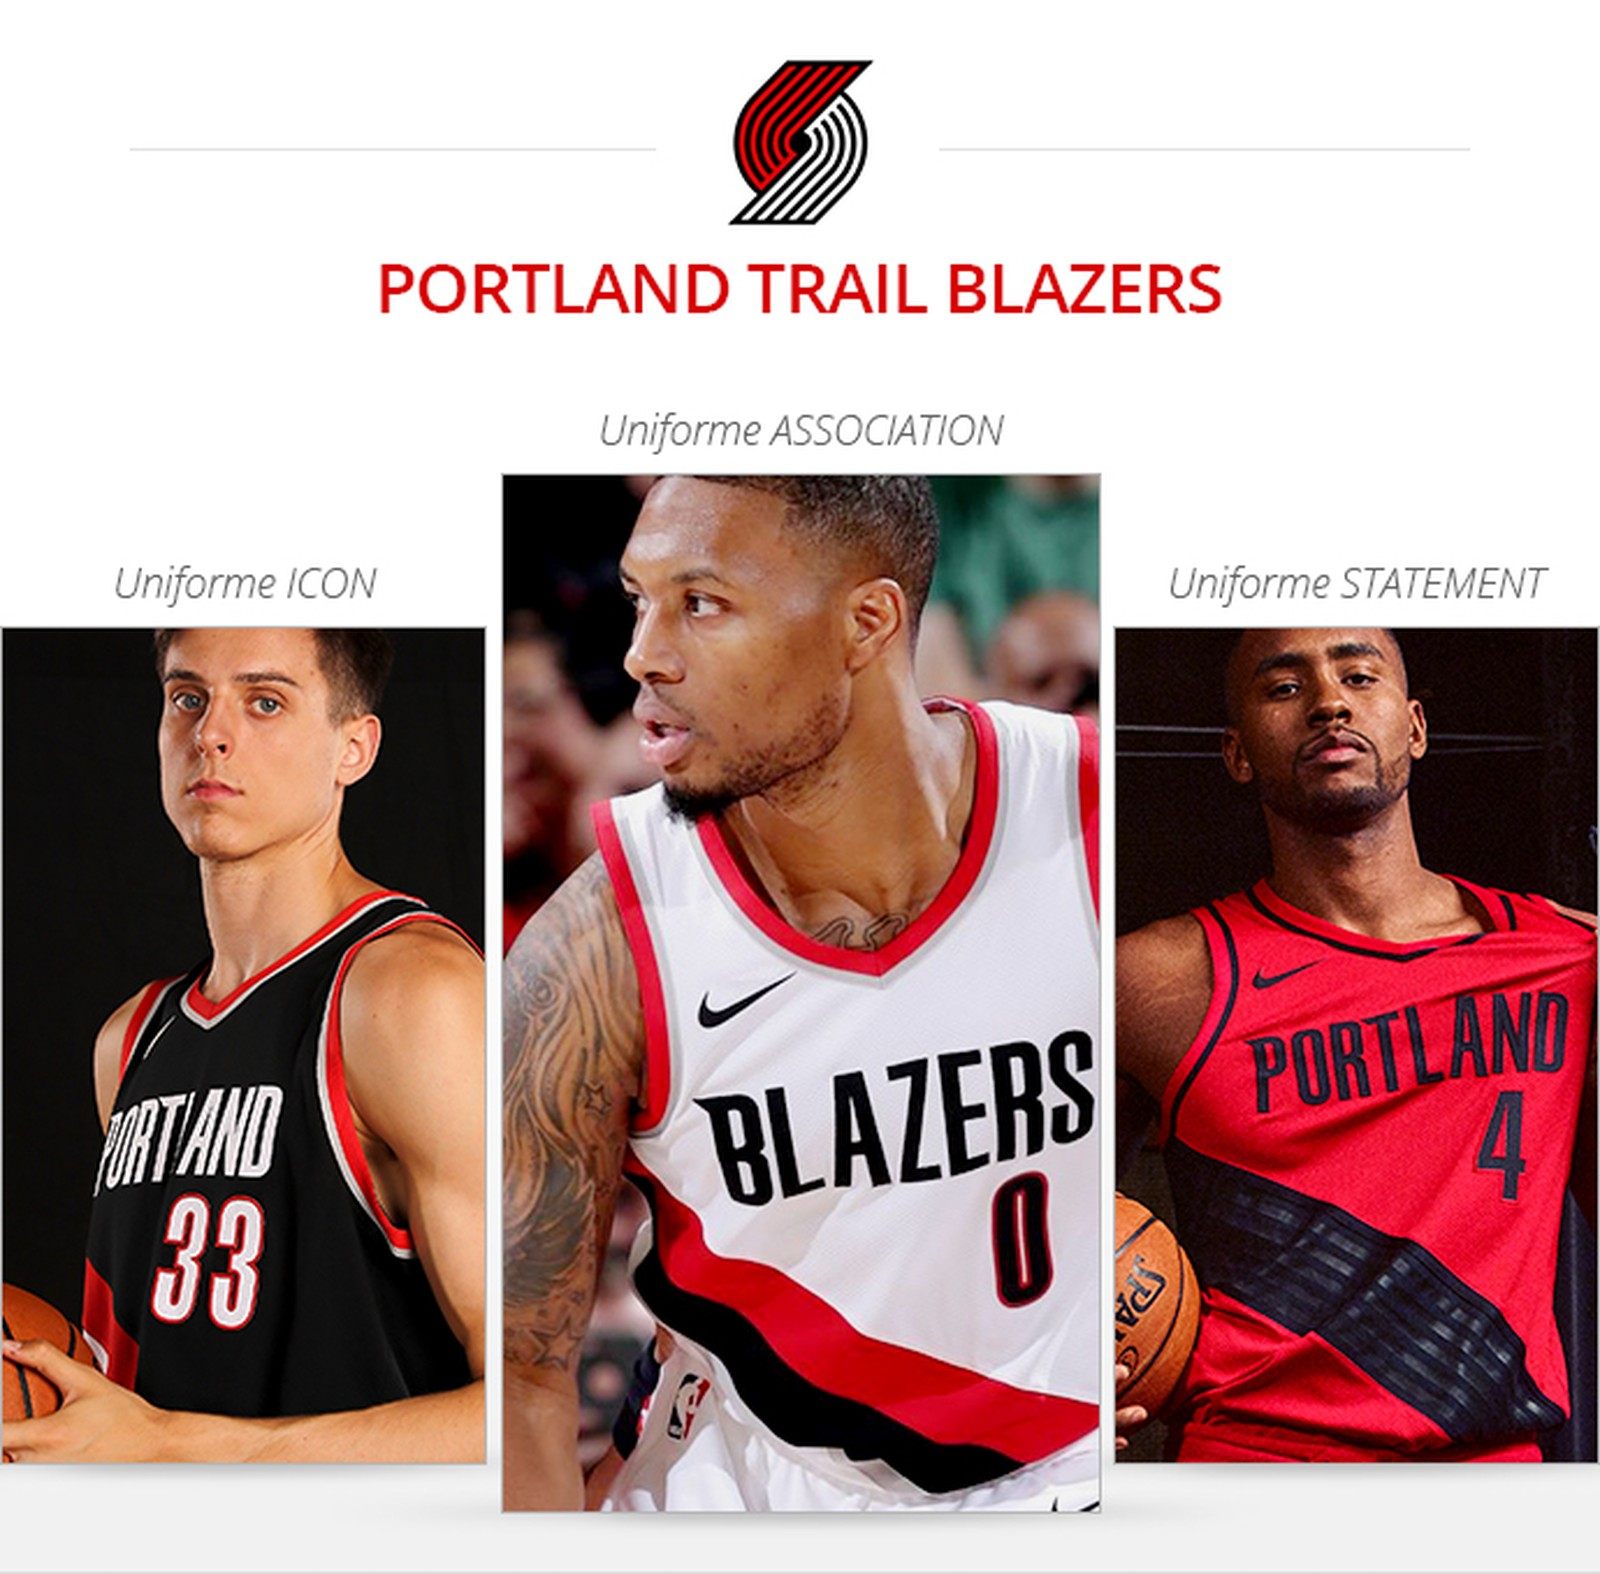 Uniformes Portland Trail Blazers saison 2017/18